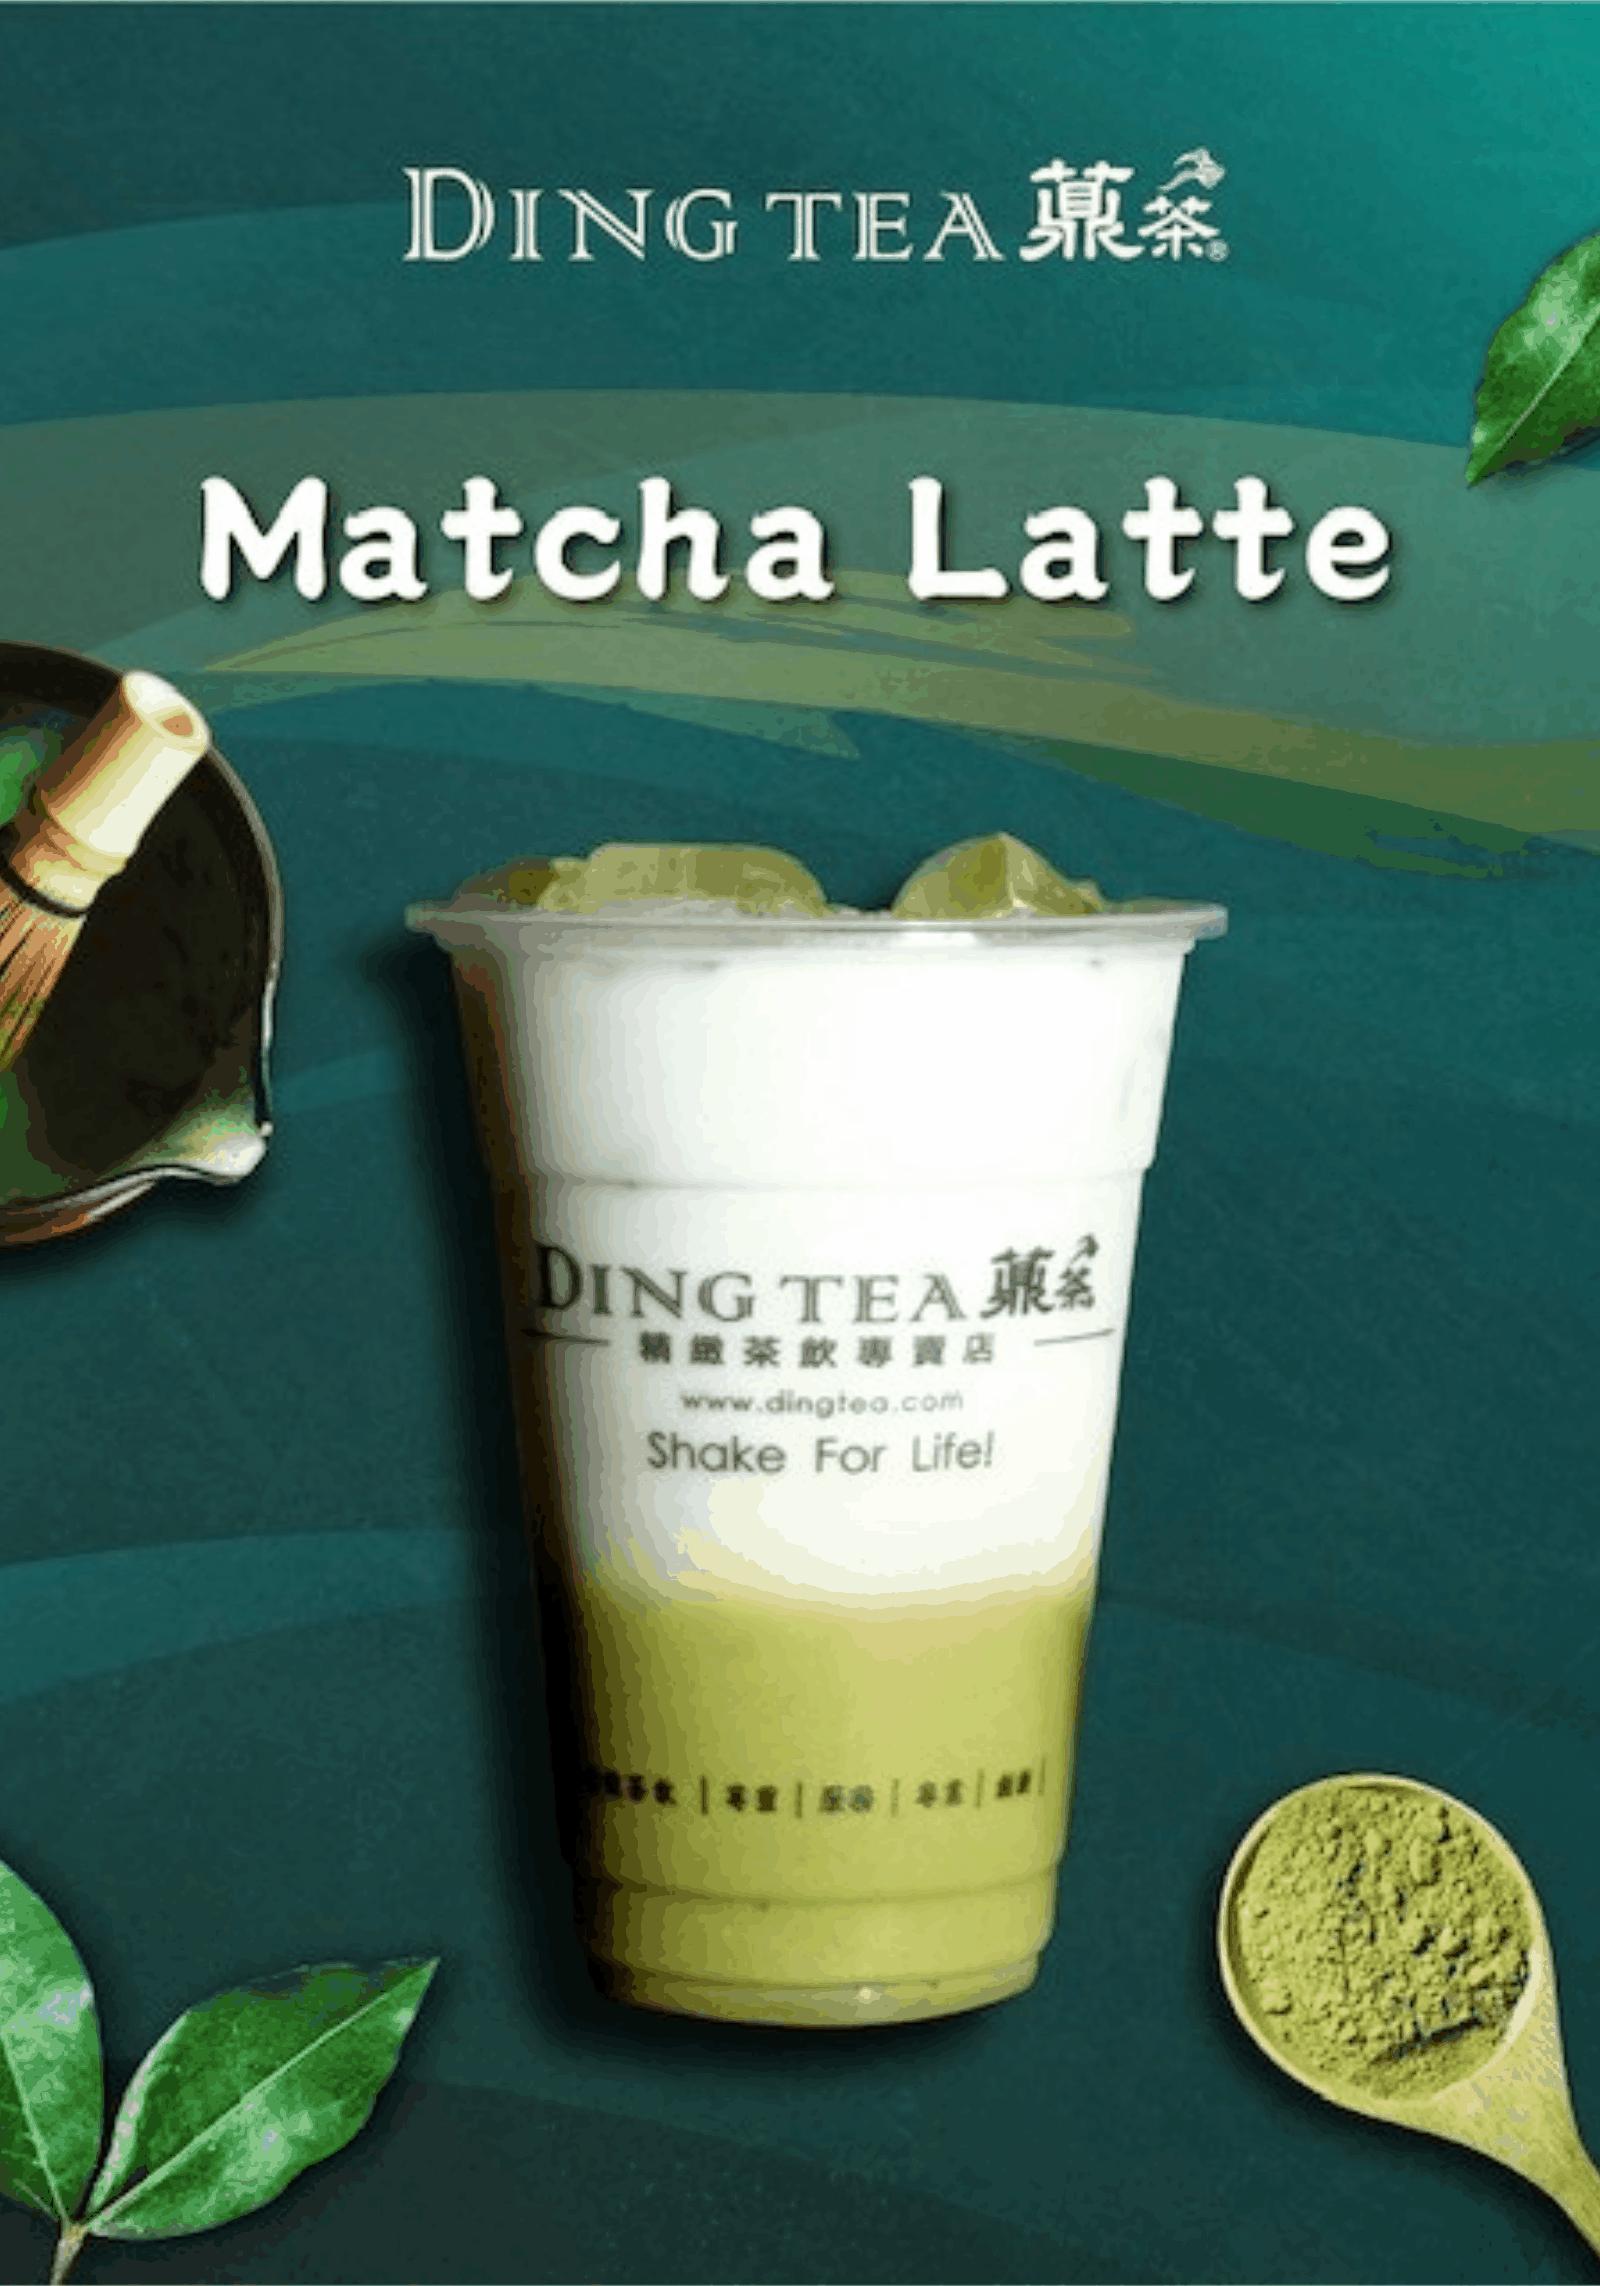 matcha-latte-tampa